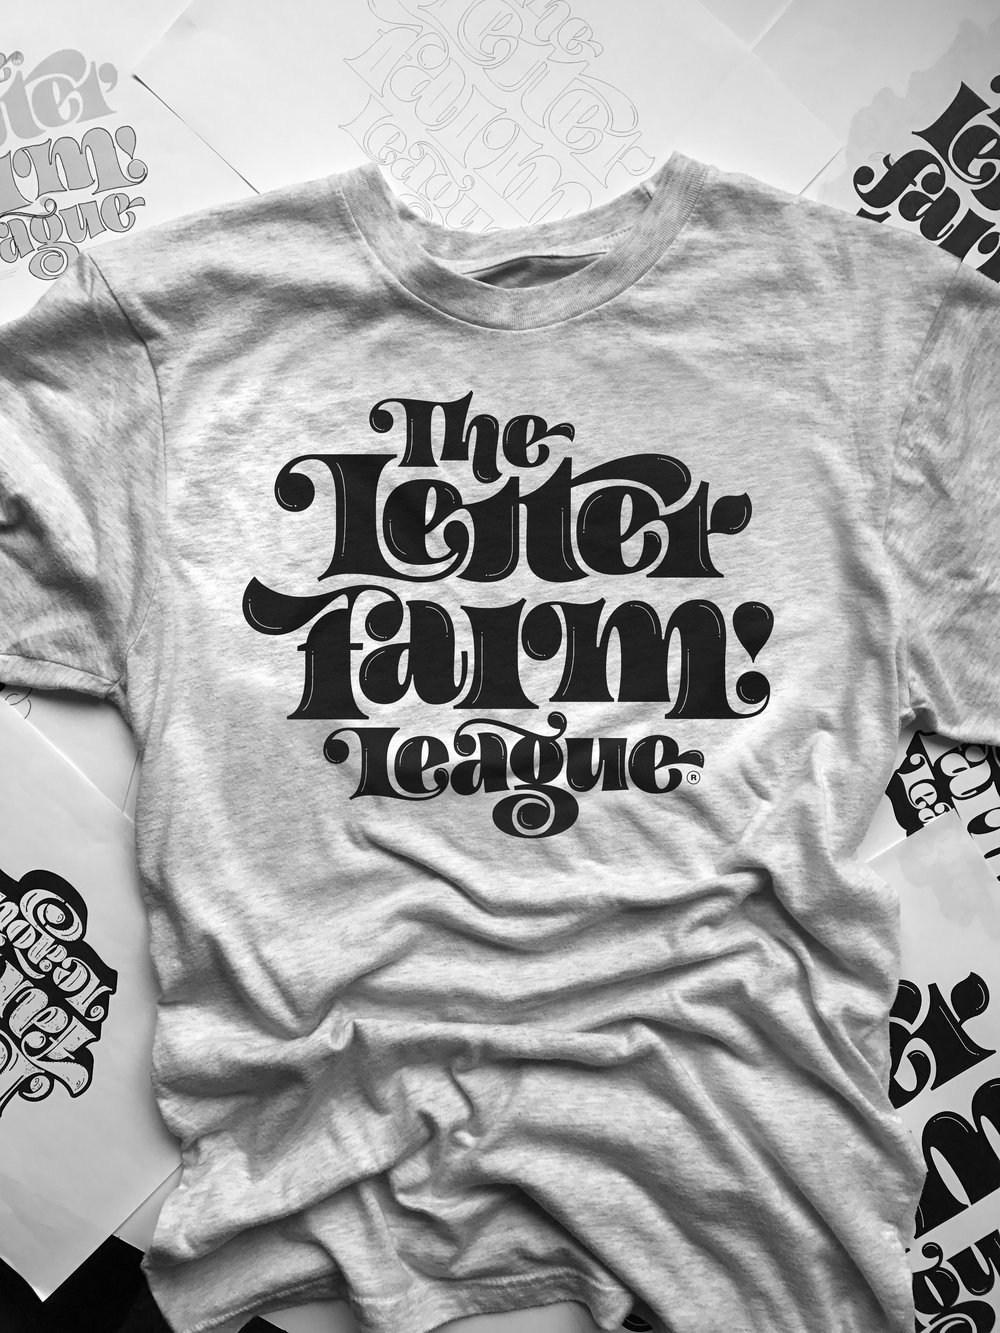 LF league shirt-1 copy.jpg